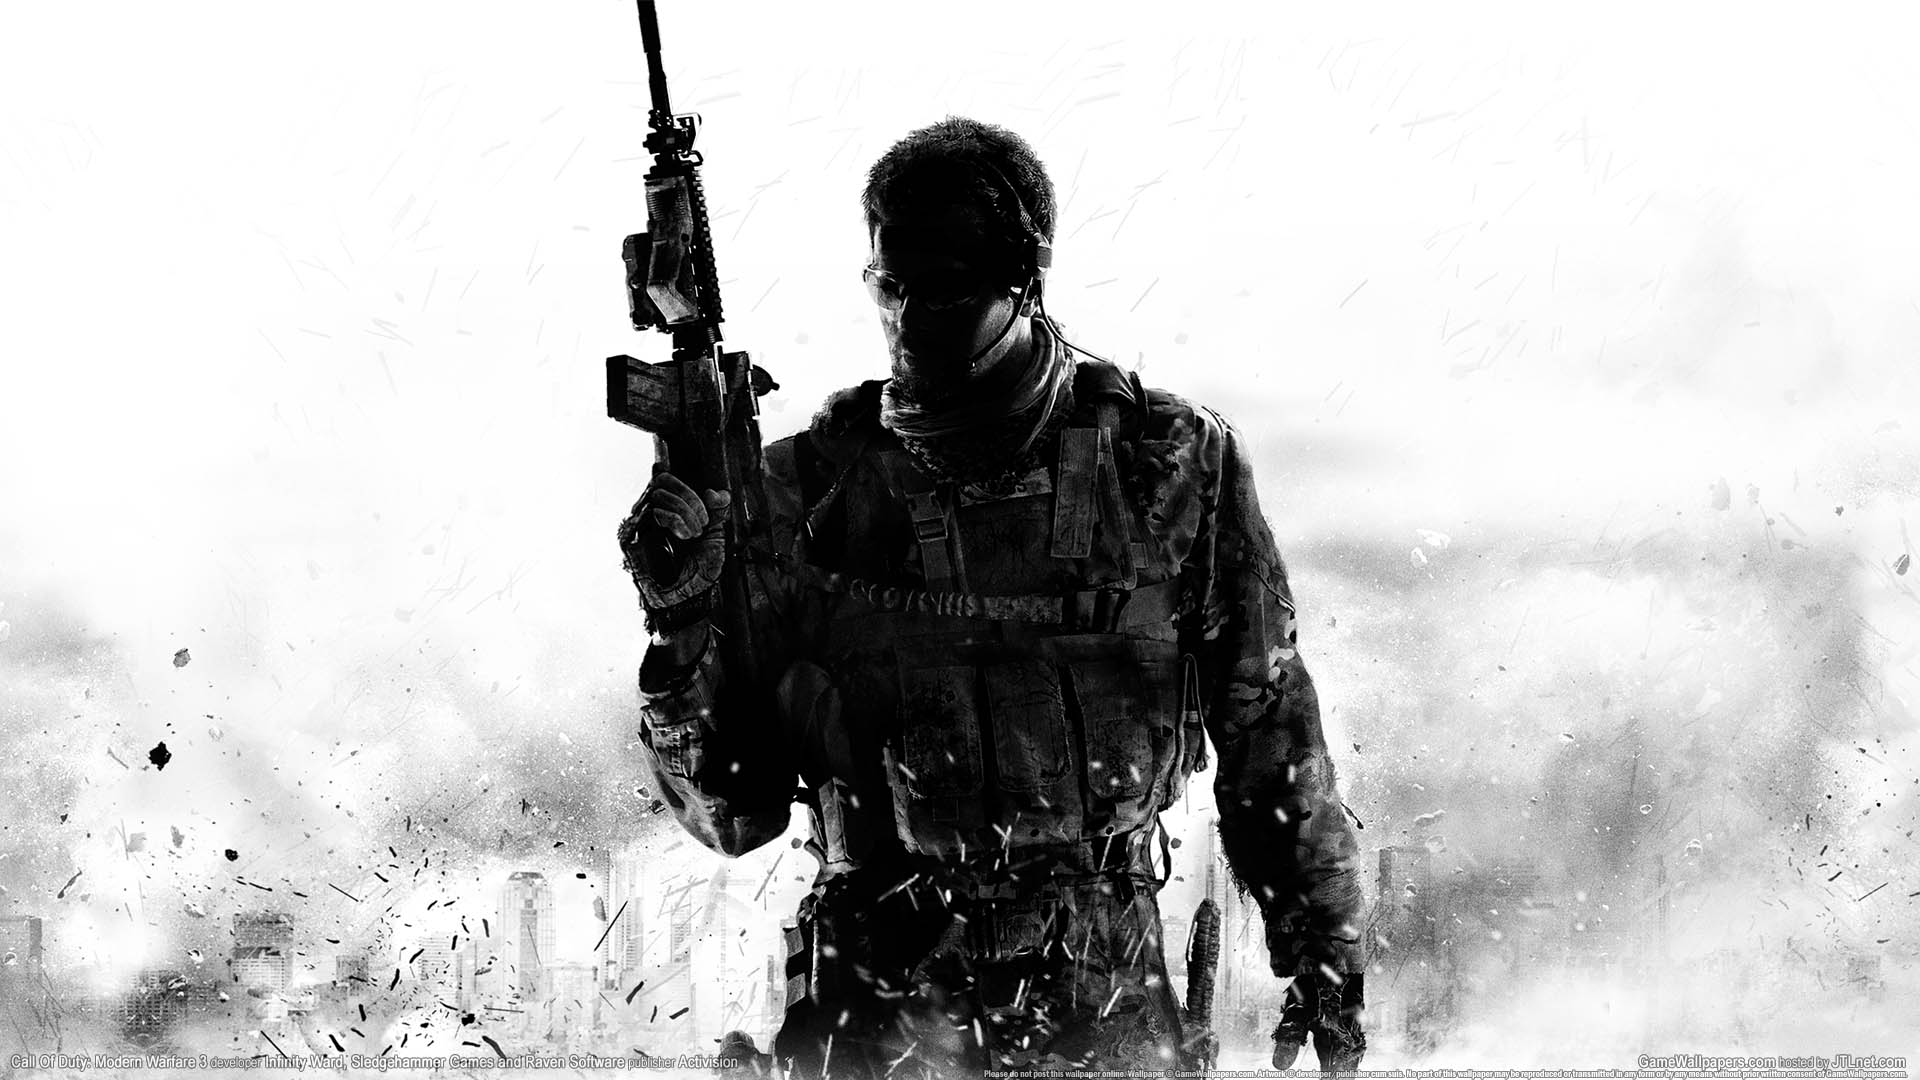 Call Of Duty: Modern Warfare 3 wallpaper 01 1920x1080